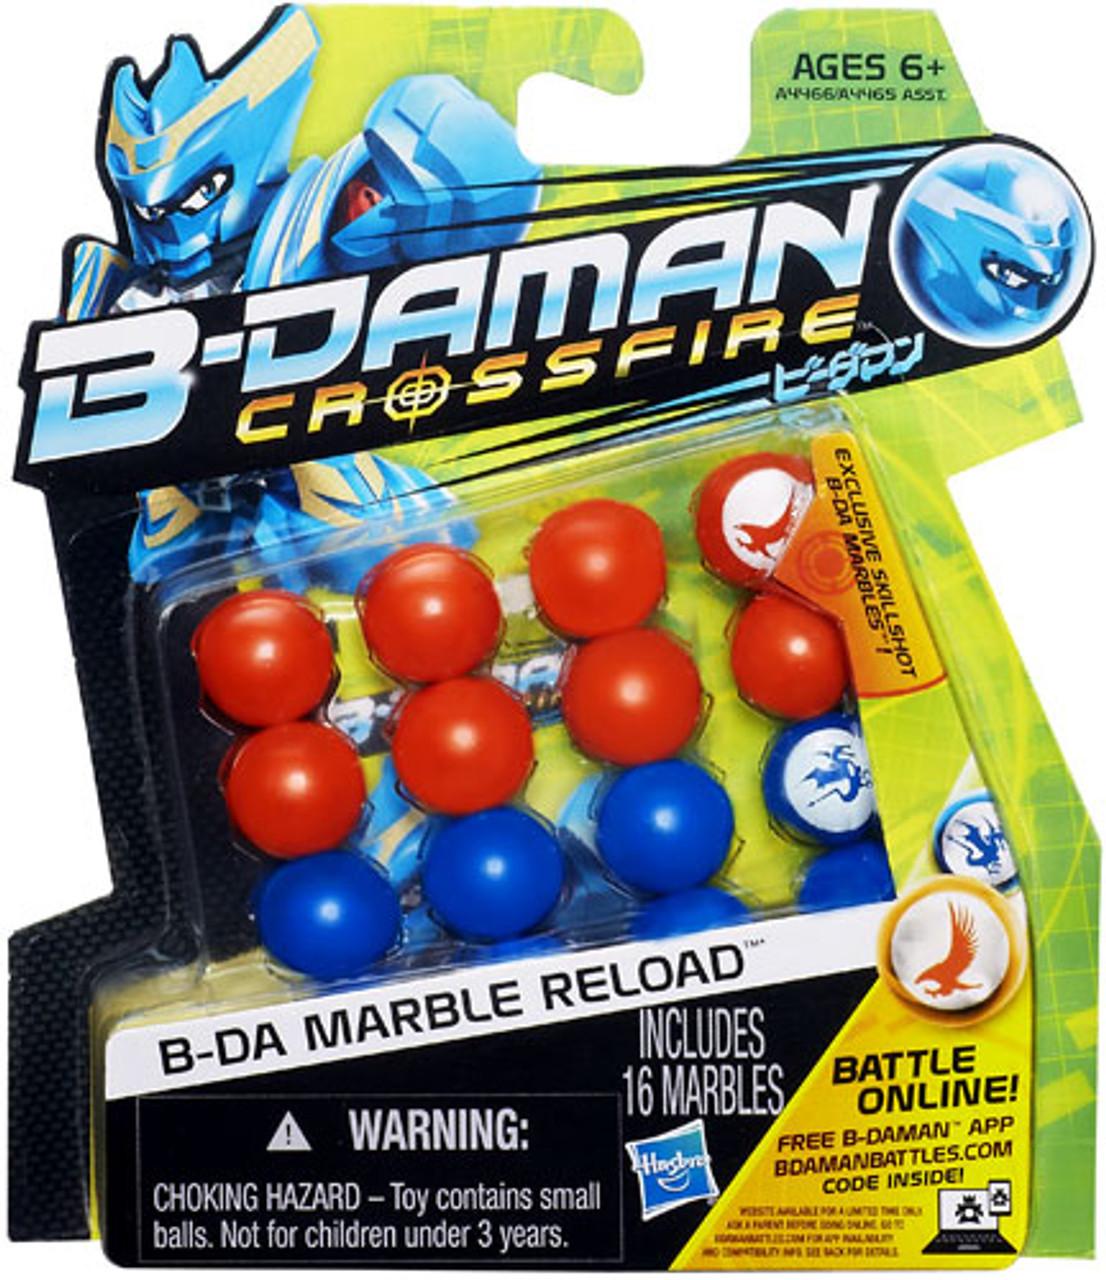 B-Daman Crossfire B-DA Marble Reload [Orange & Blue]